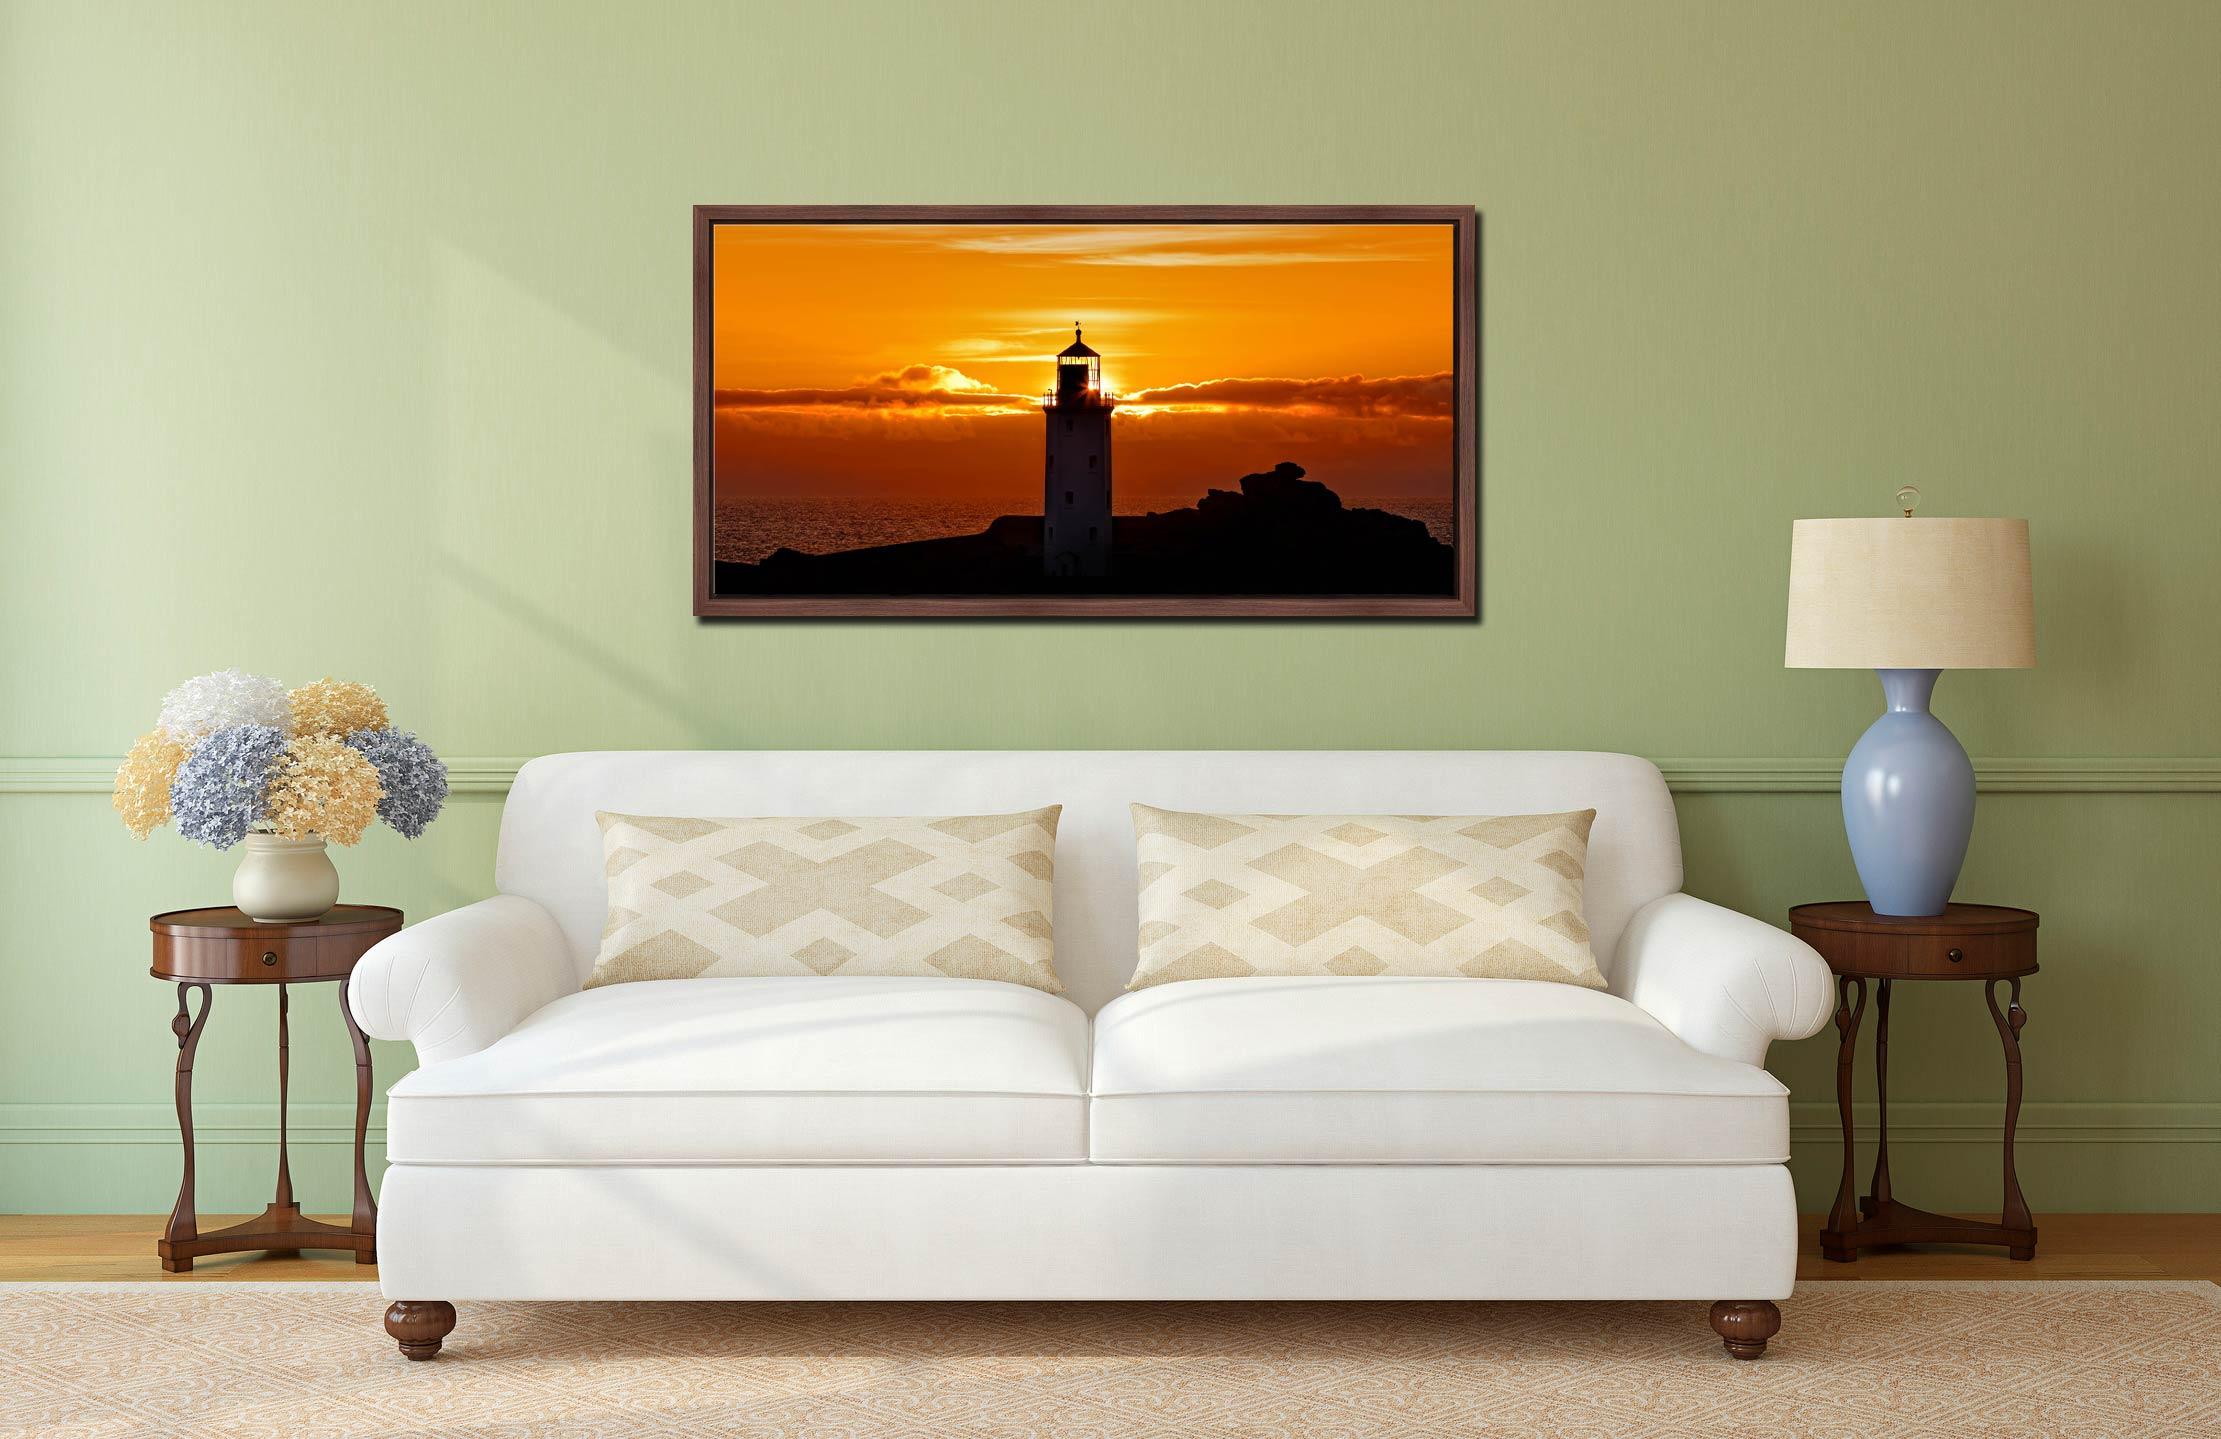 Sunbeams of Godrevy Lighthouse - Walnut floater frame with acrylic glazing on Wall